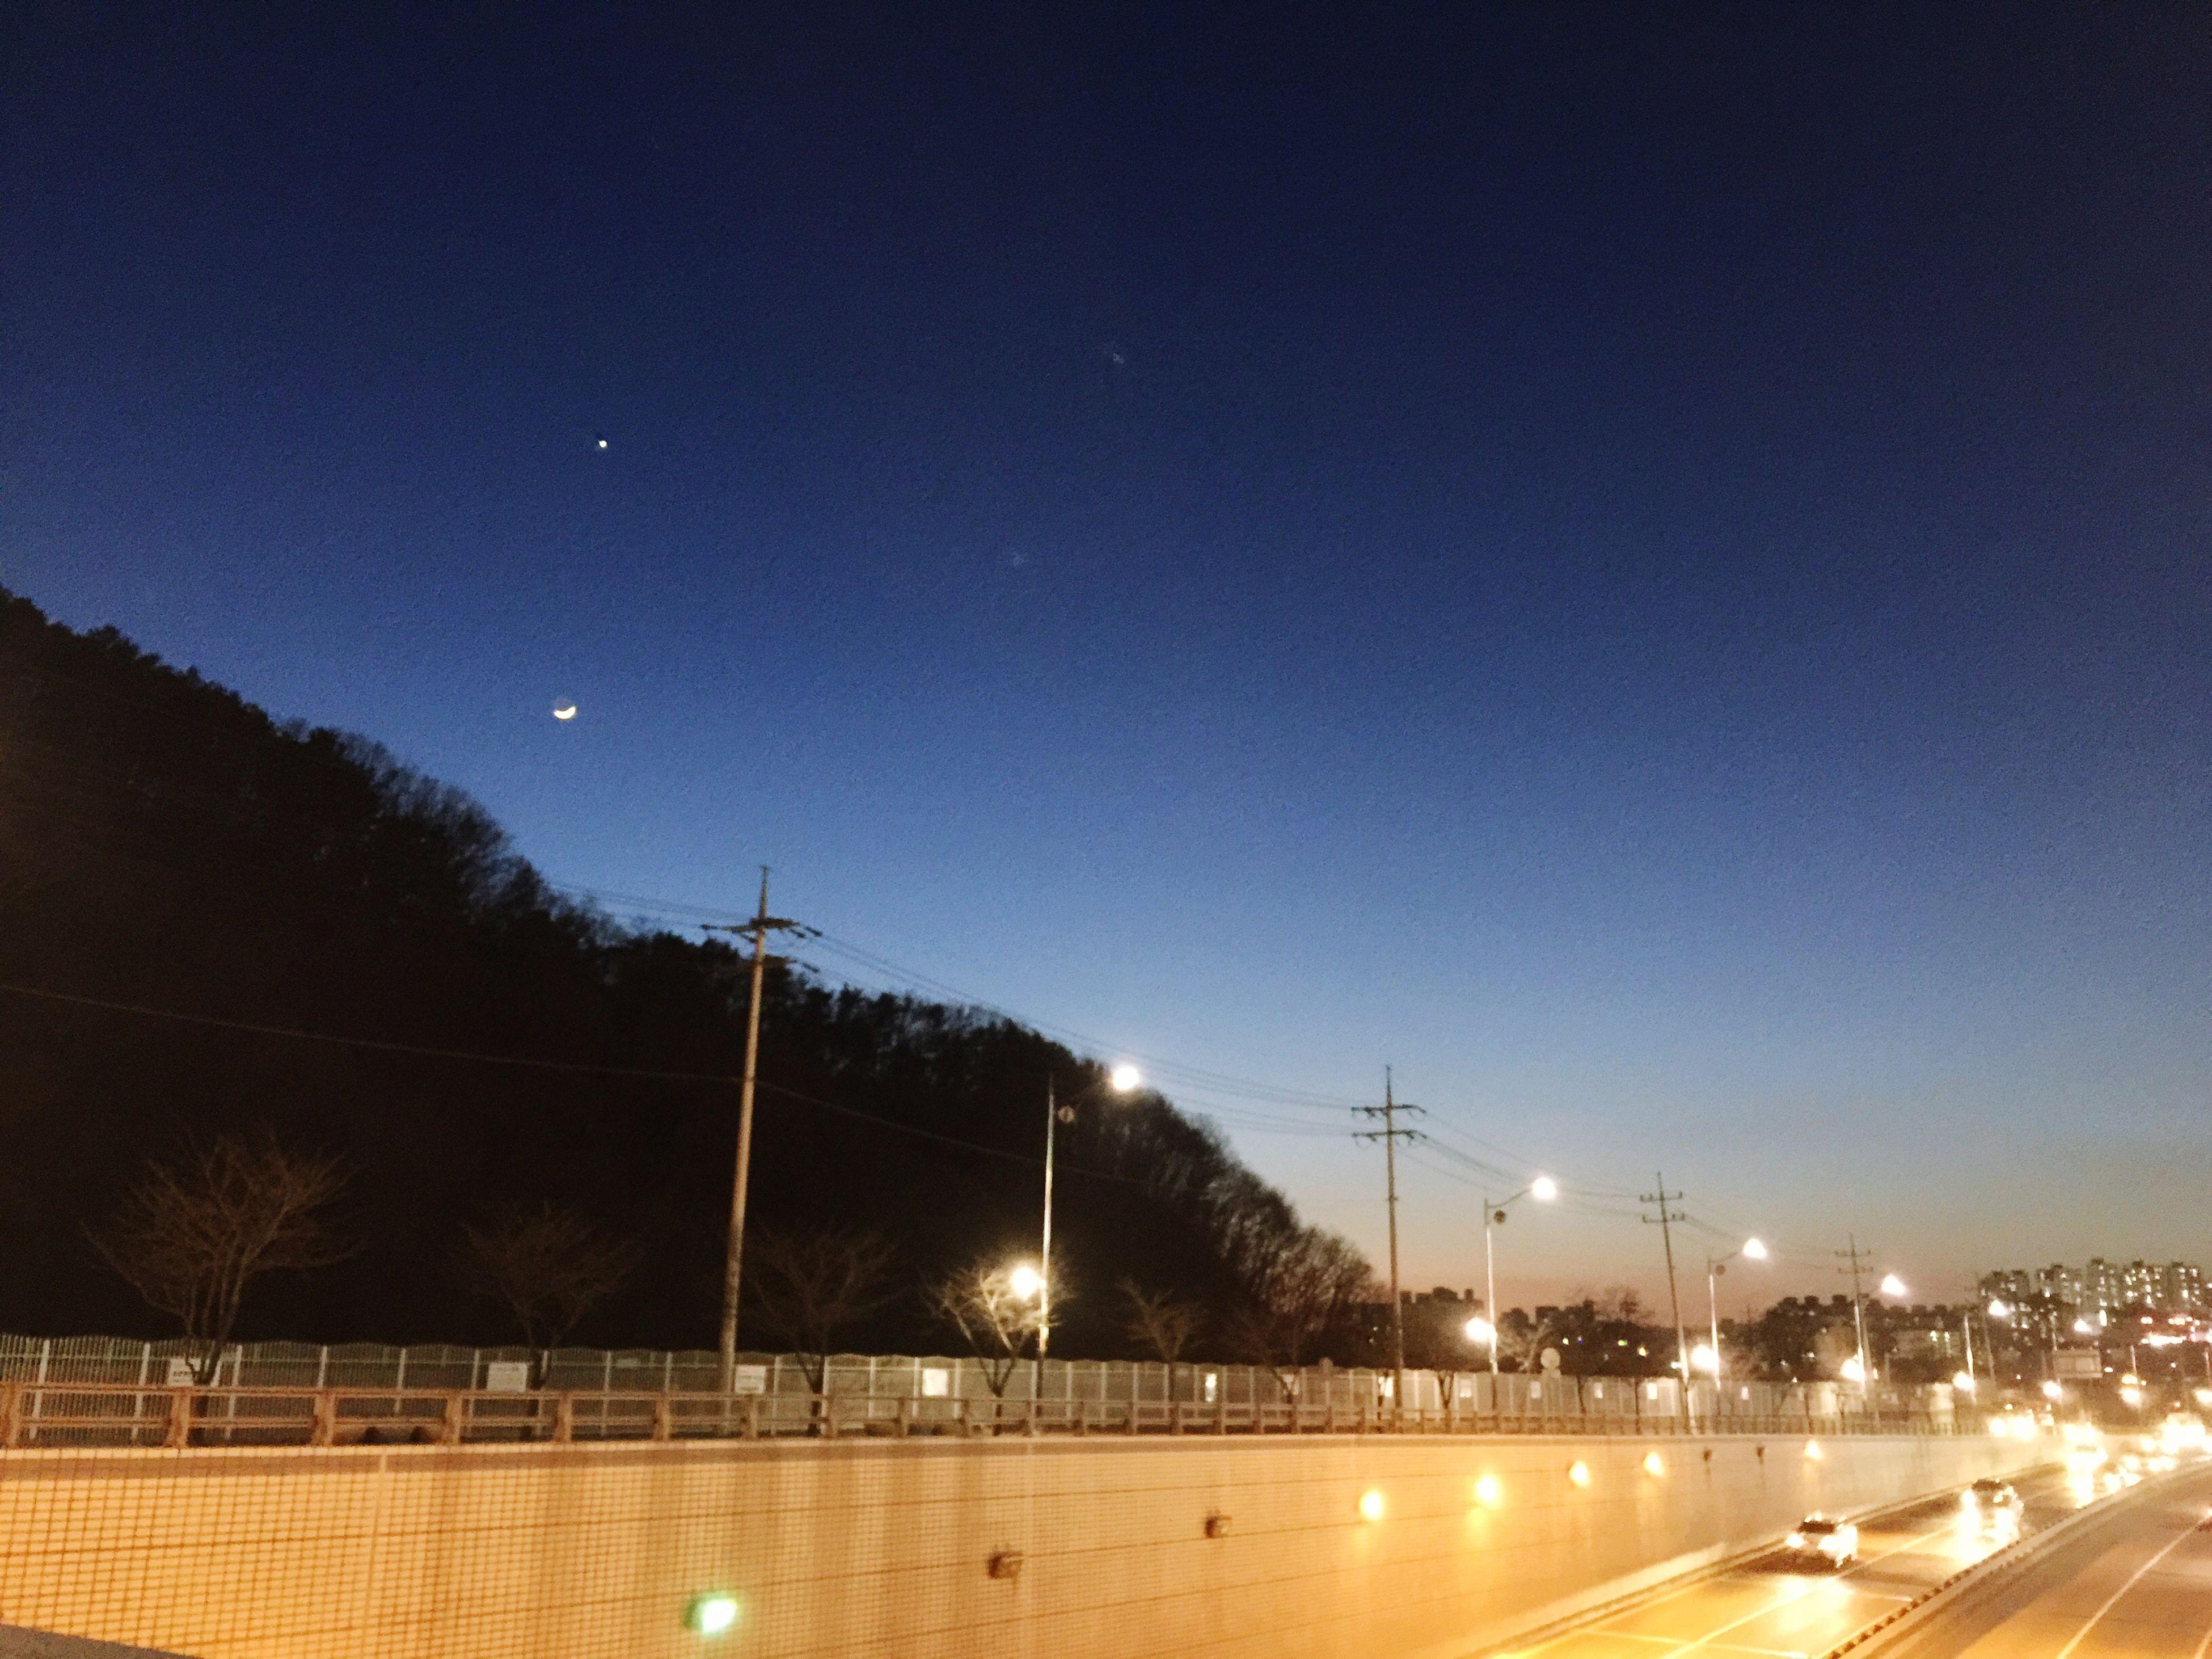 2015.03.22 Crescent Moon Seems Like Nail 🌙